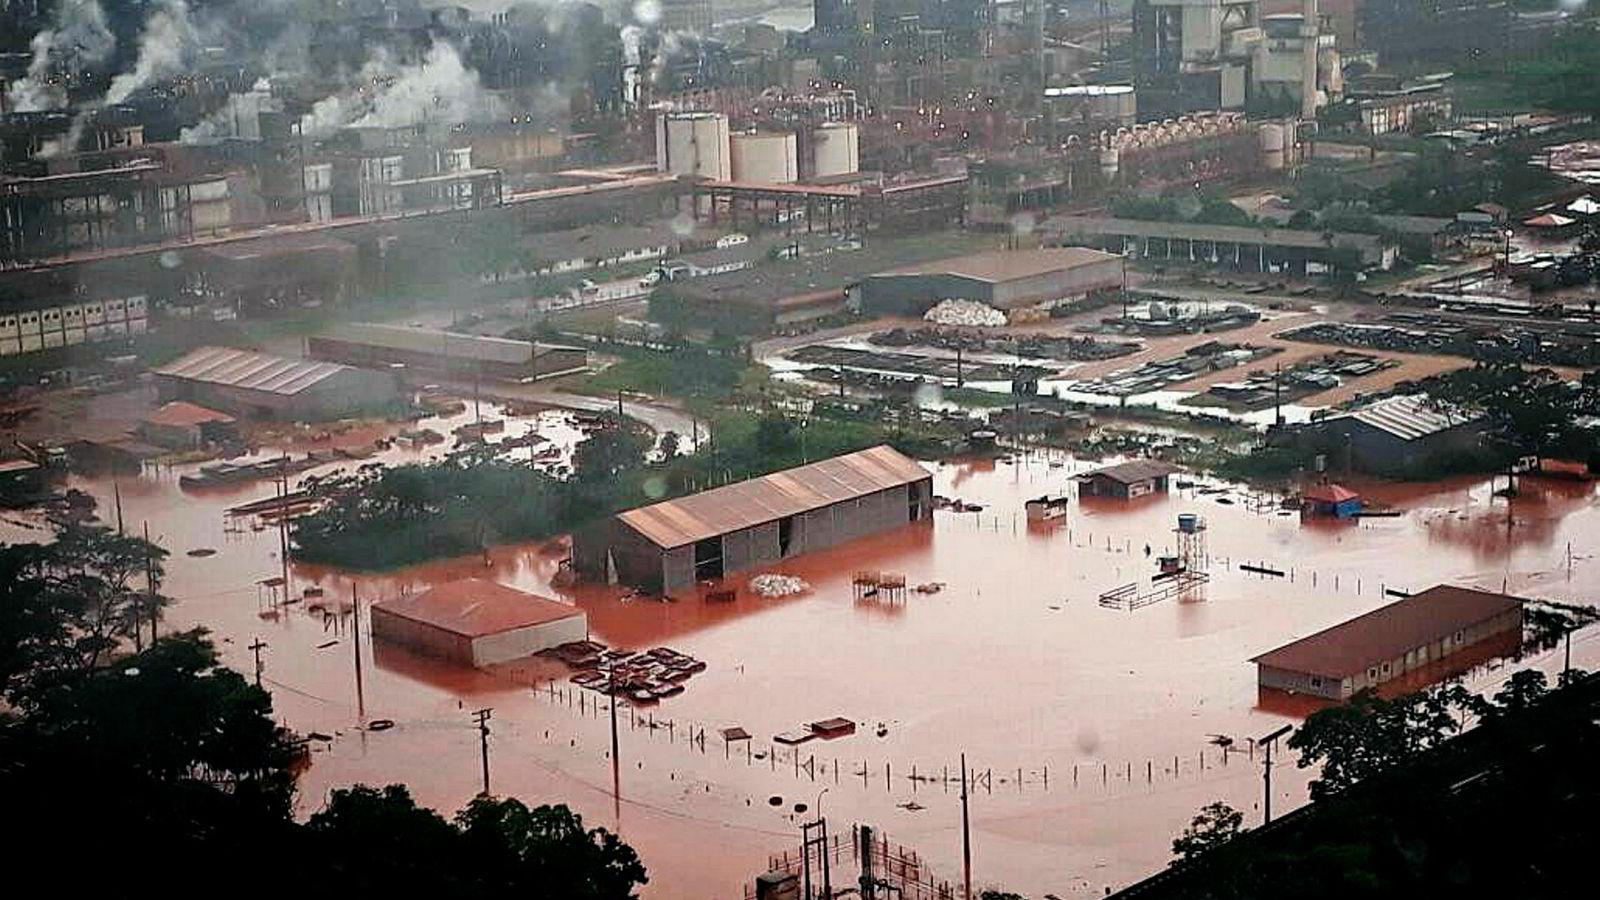 Et kraftig regnvær overveldet Alunortes vannbehandlingssystem og førte til oversvømmelser. Dette var starten på den verste stormen i Hydros historie.